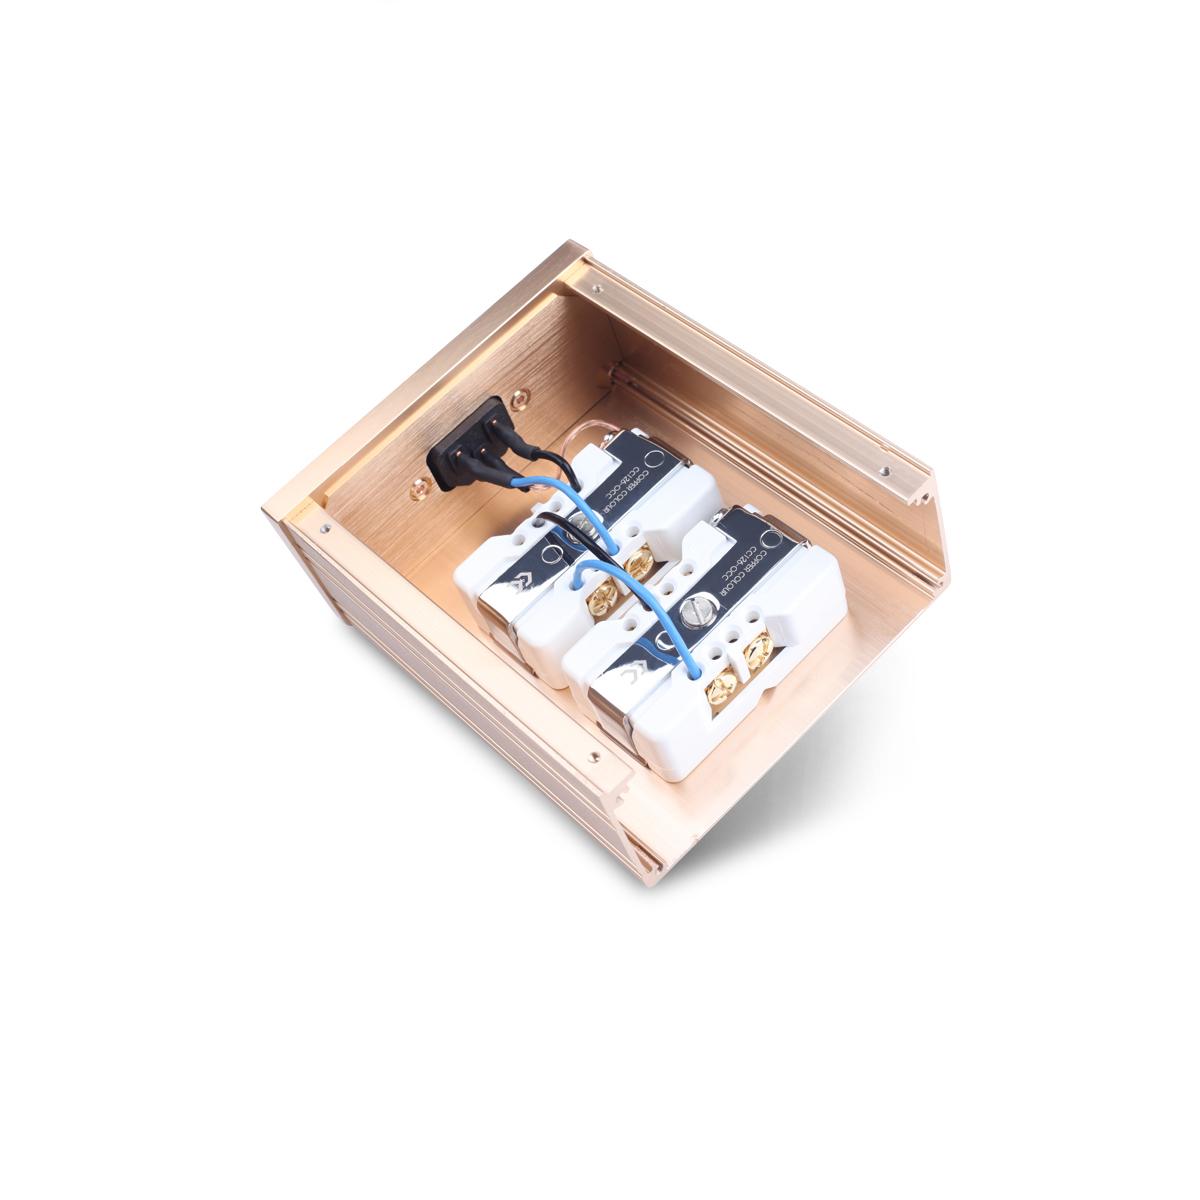 CopperColour/铜彩 LASE发烧级音响紫铜插座4位排插美标电源插座